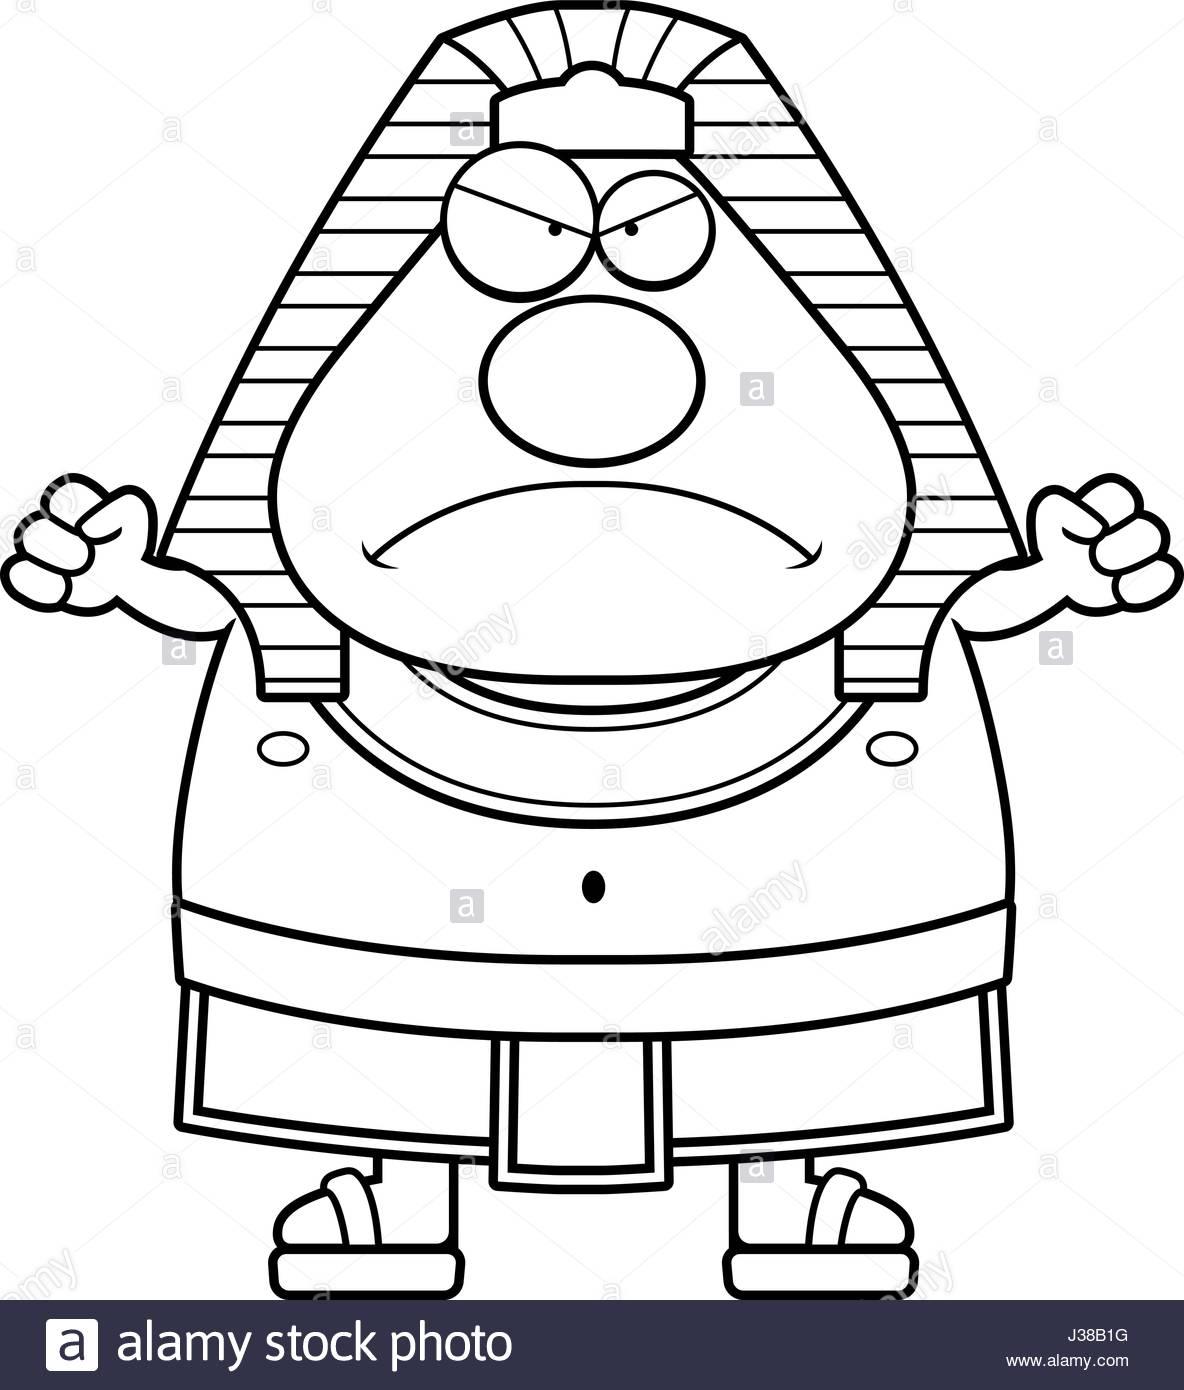 1184x1390 A Cartoon Illustration Of An Egyptian Pharaoh Looking Angry Stock